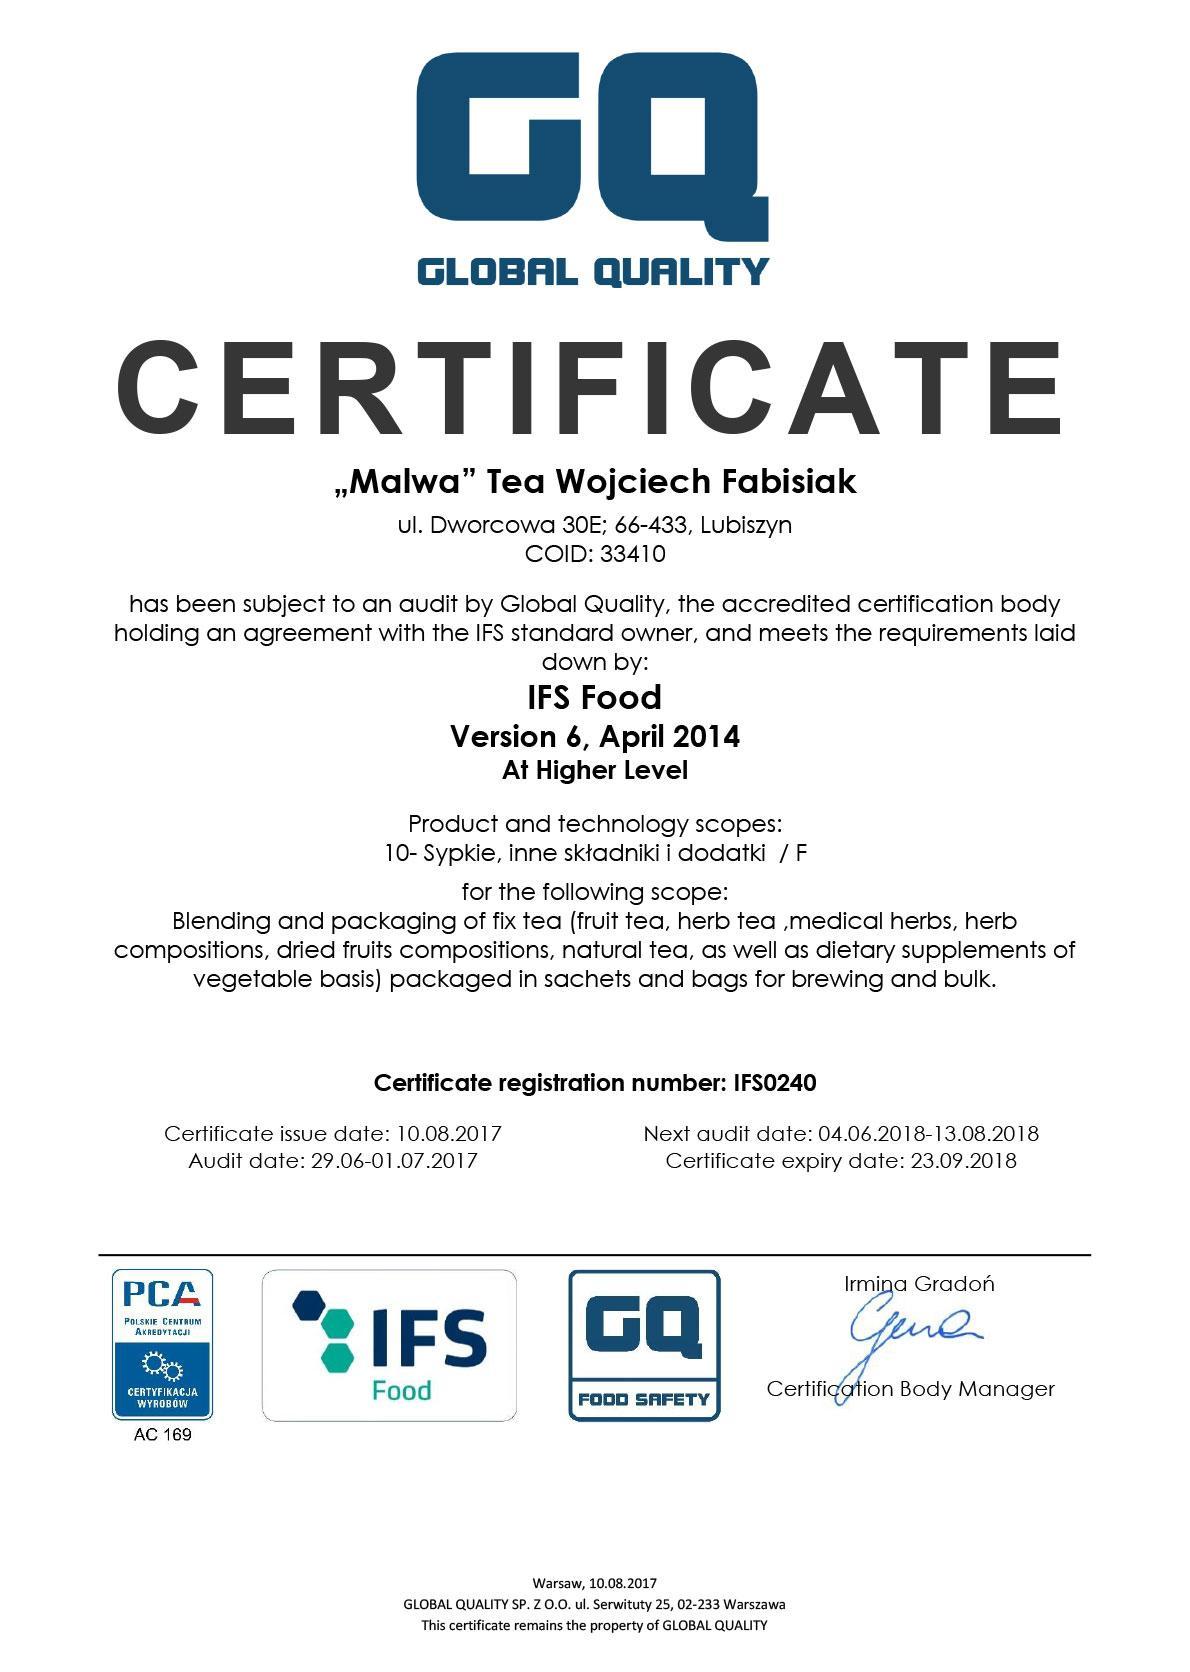 ifs malwa tea certification